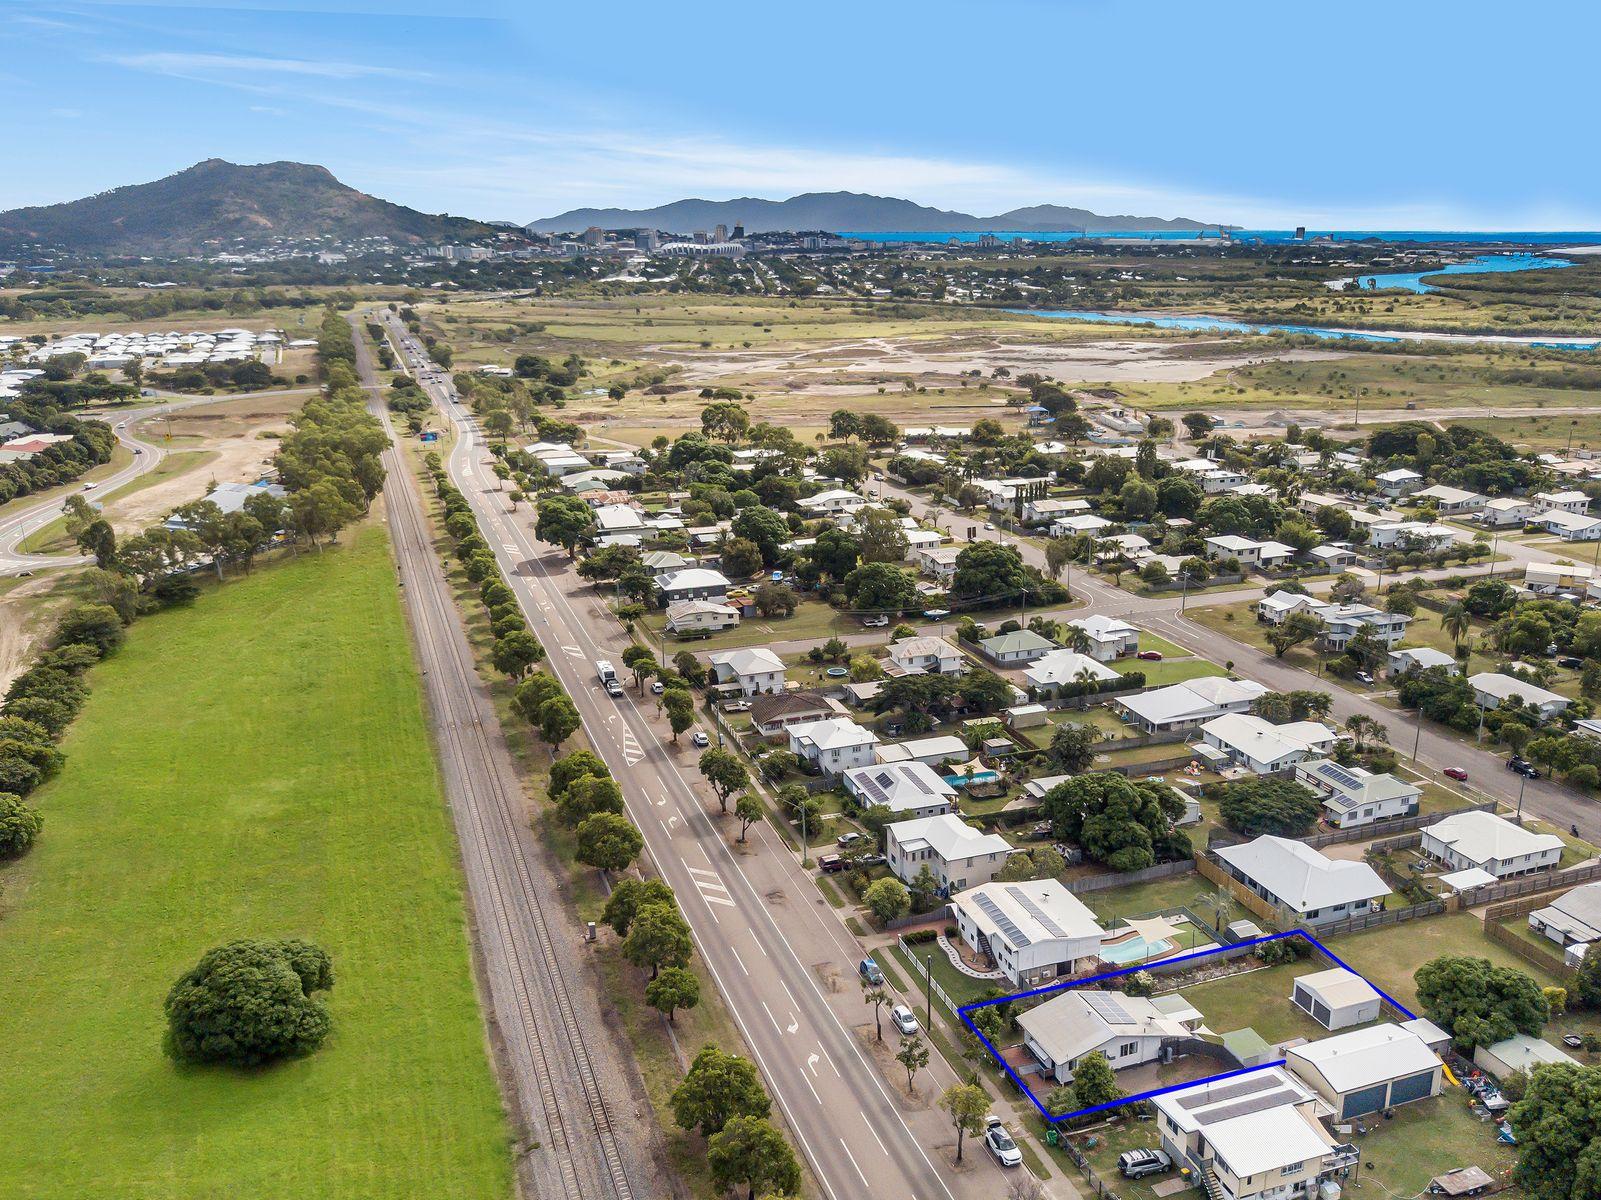 38 Abbott Street, Oonoonba, QLD 4811